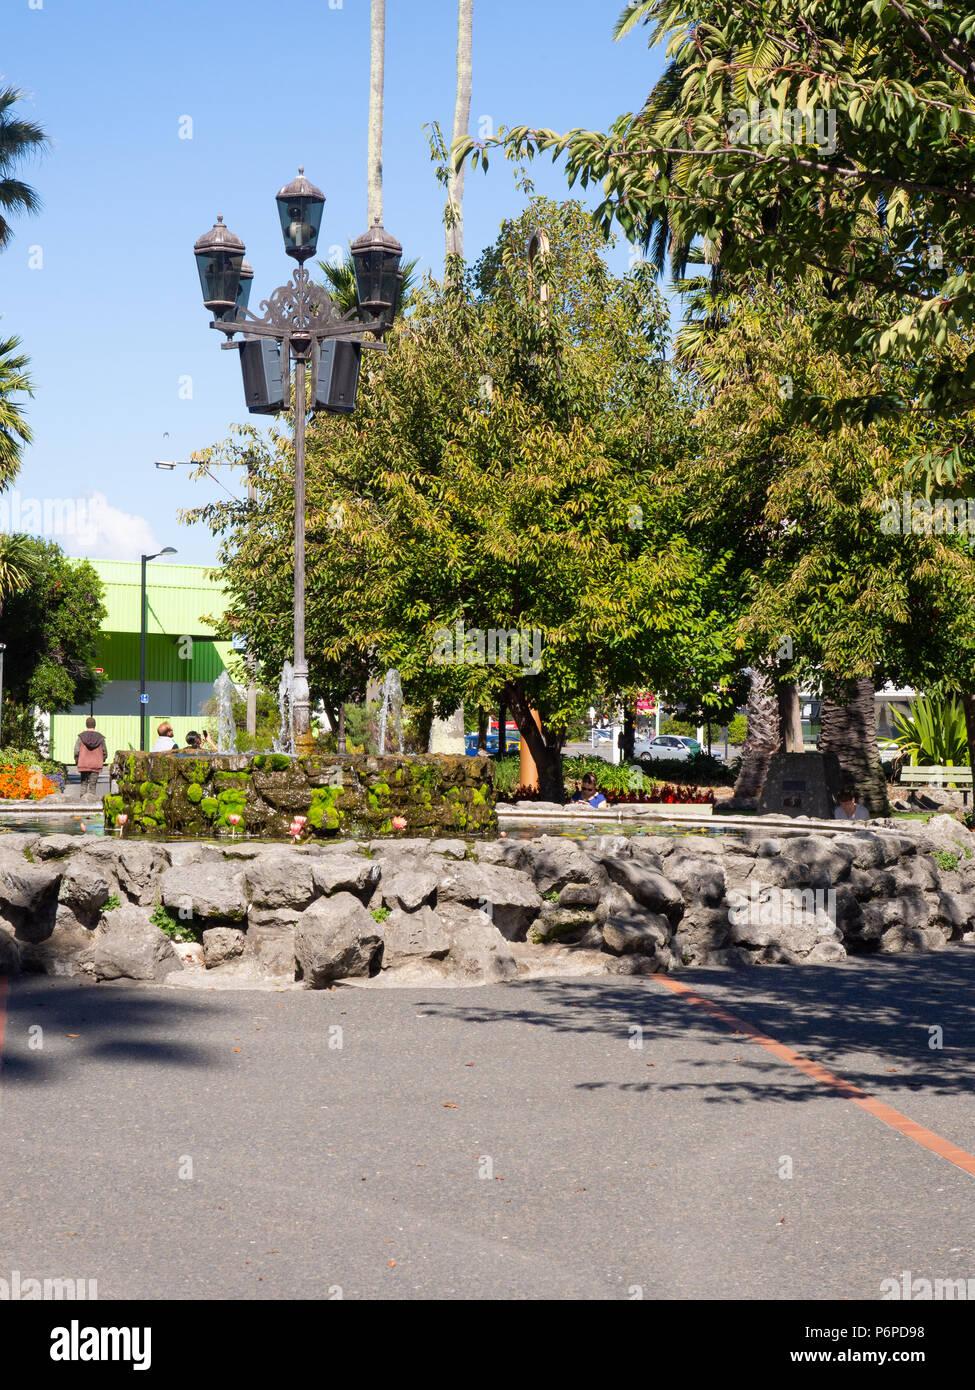 Garden Lights In Clive Square Garden In Napier - Stock Image